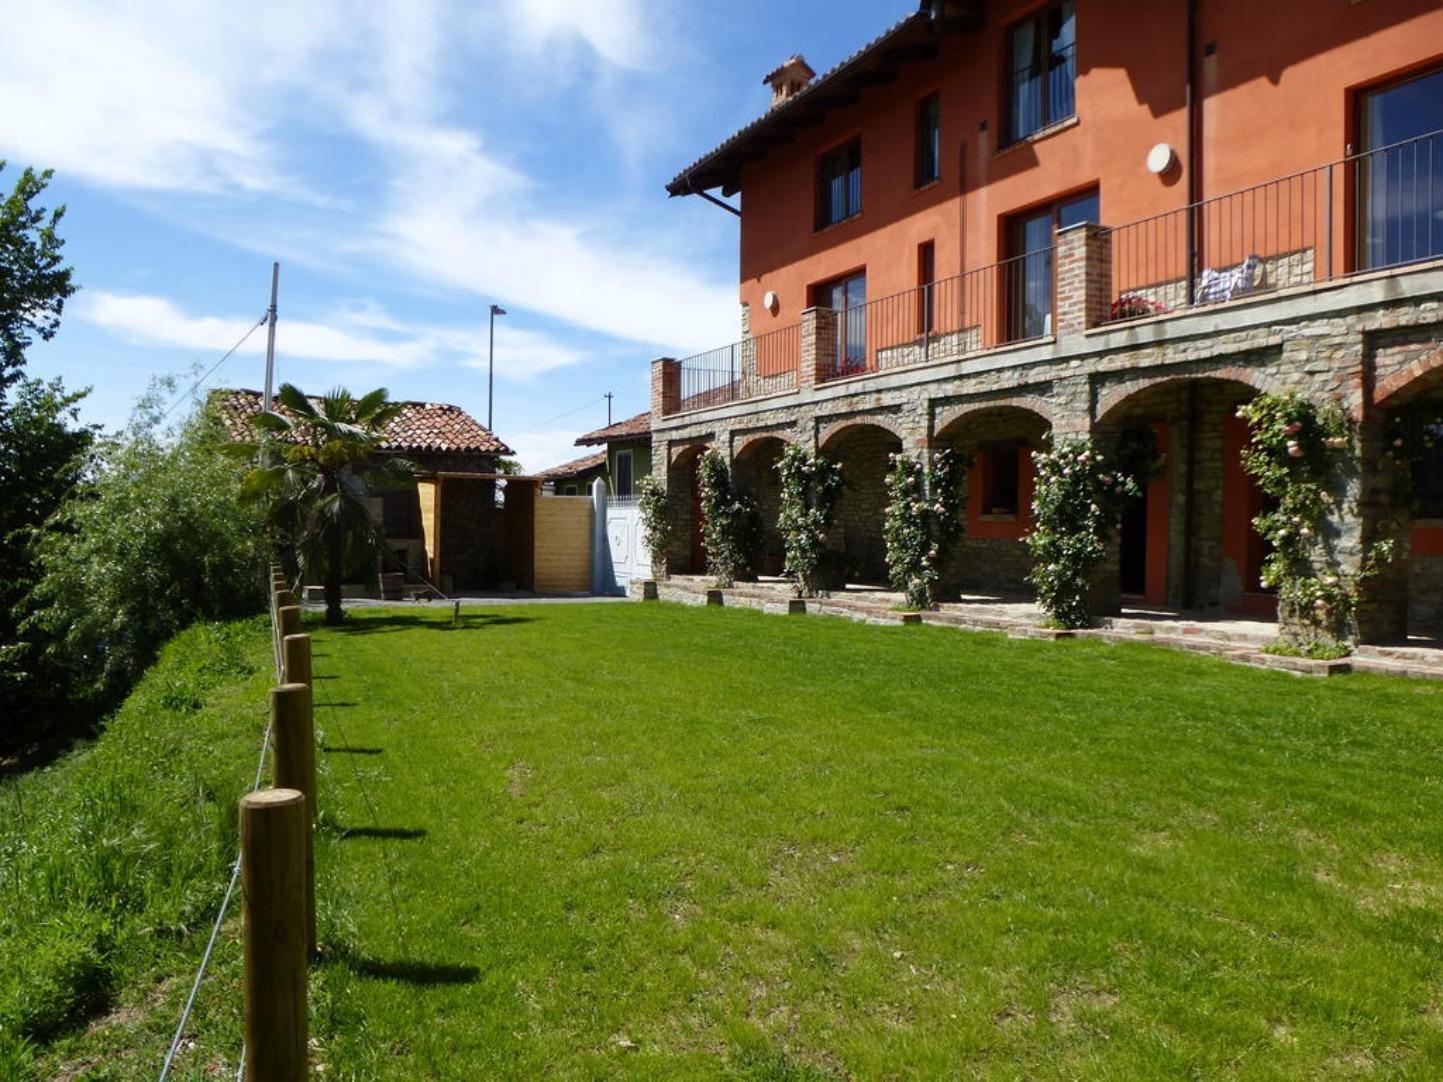 A large brick building with green grass at La Corte Di Langga.